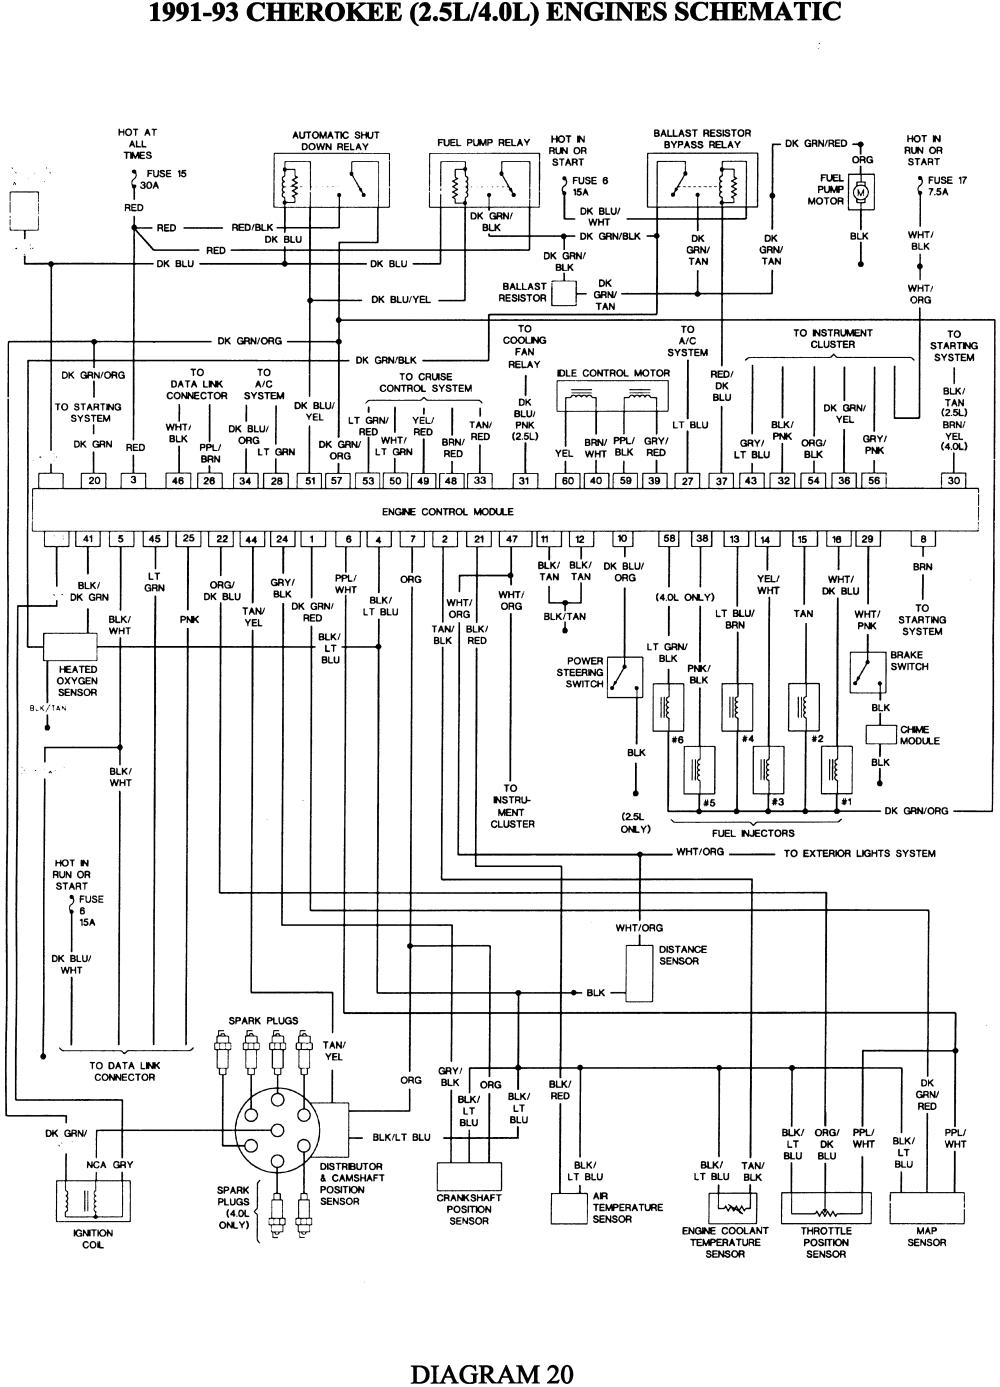 1996 Jeep Grand Cherokee Wiring Diagram 087fd14 2008 Jeep Grand Cherokee Wiring Diagram Wiring Library